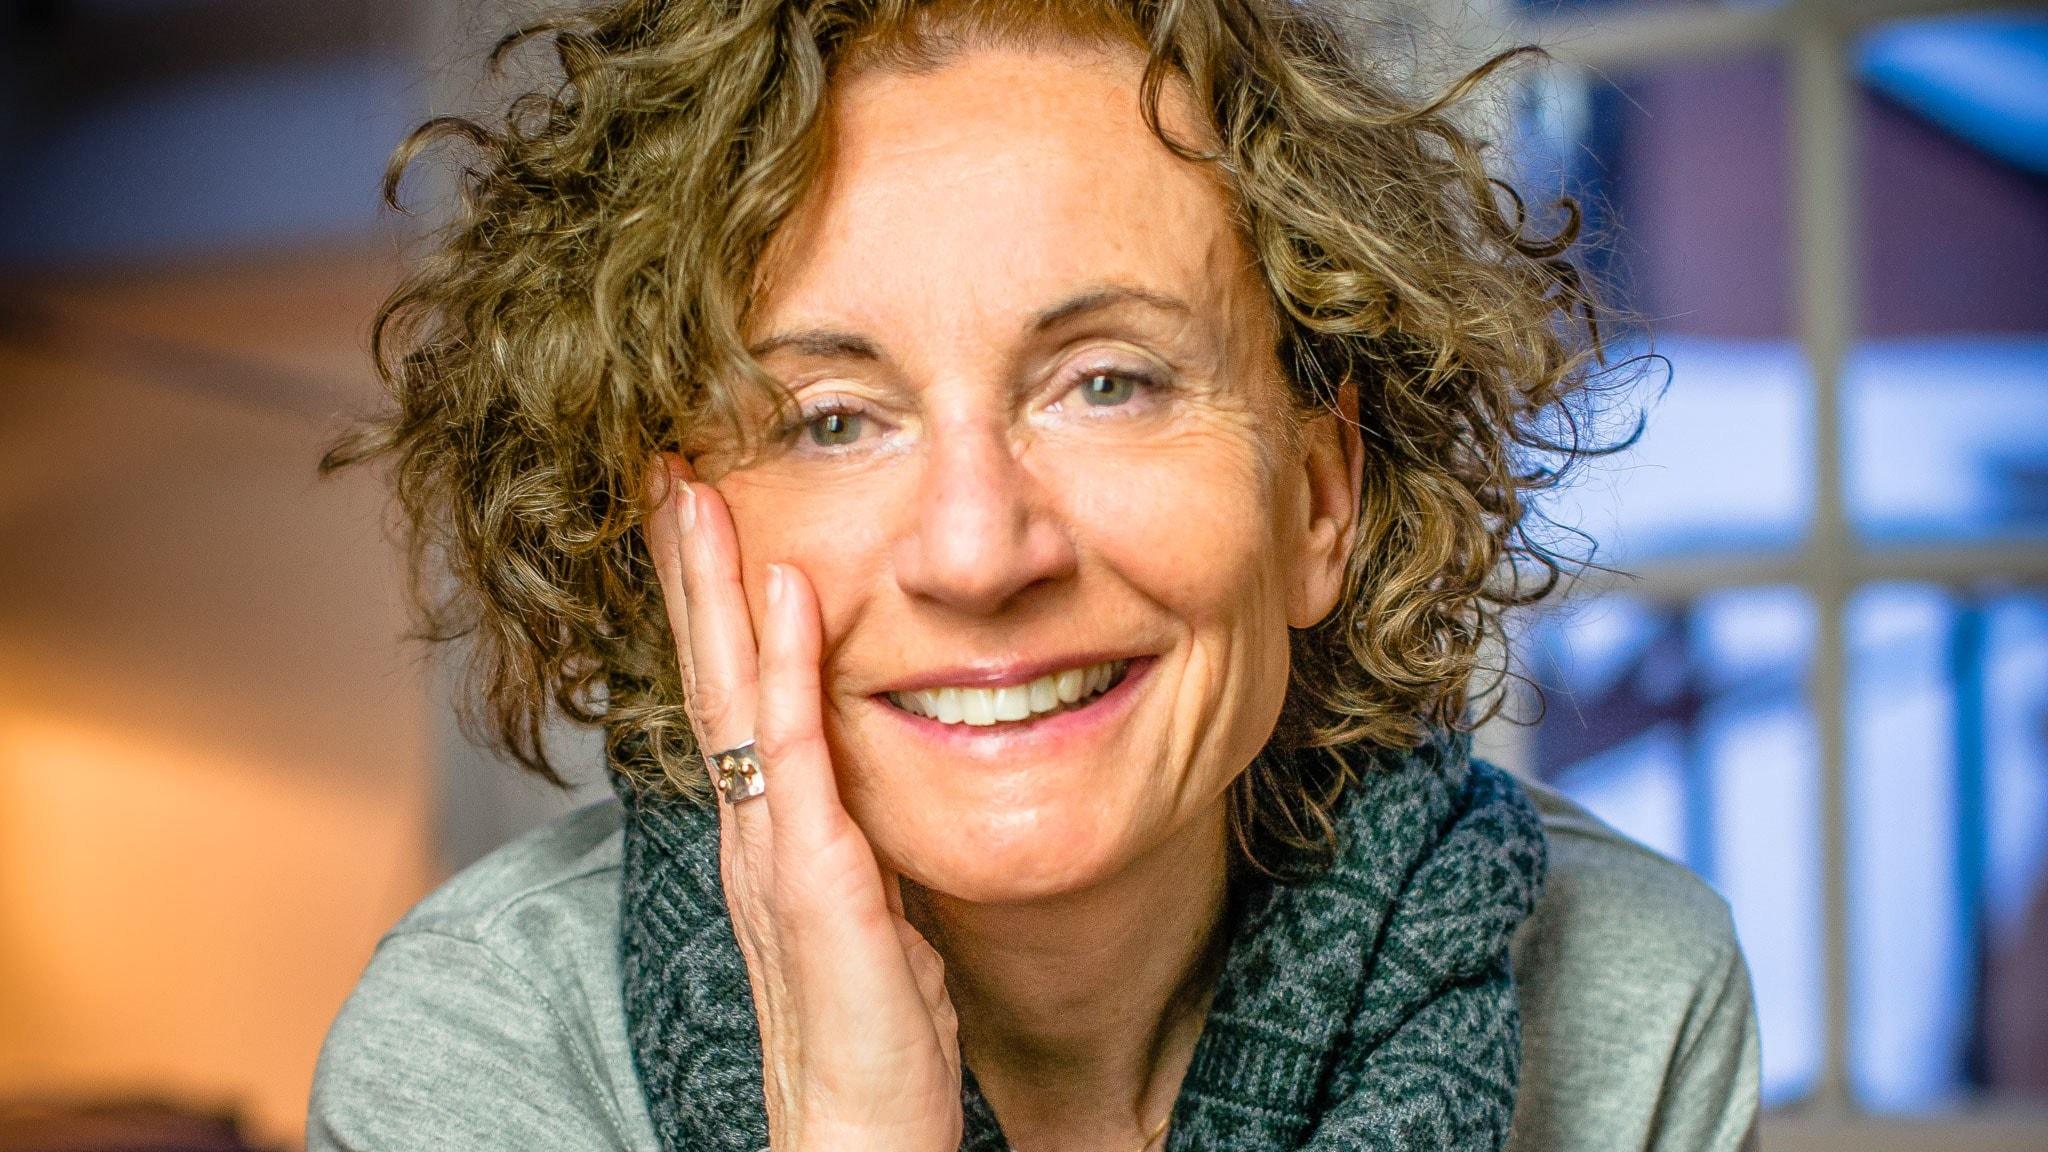 Ingrid Lomfors - Samtidigt i Halle